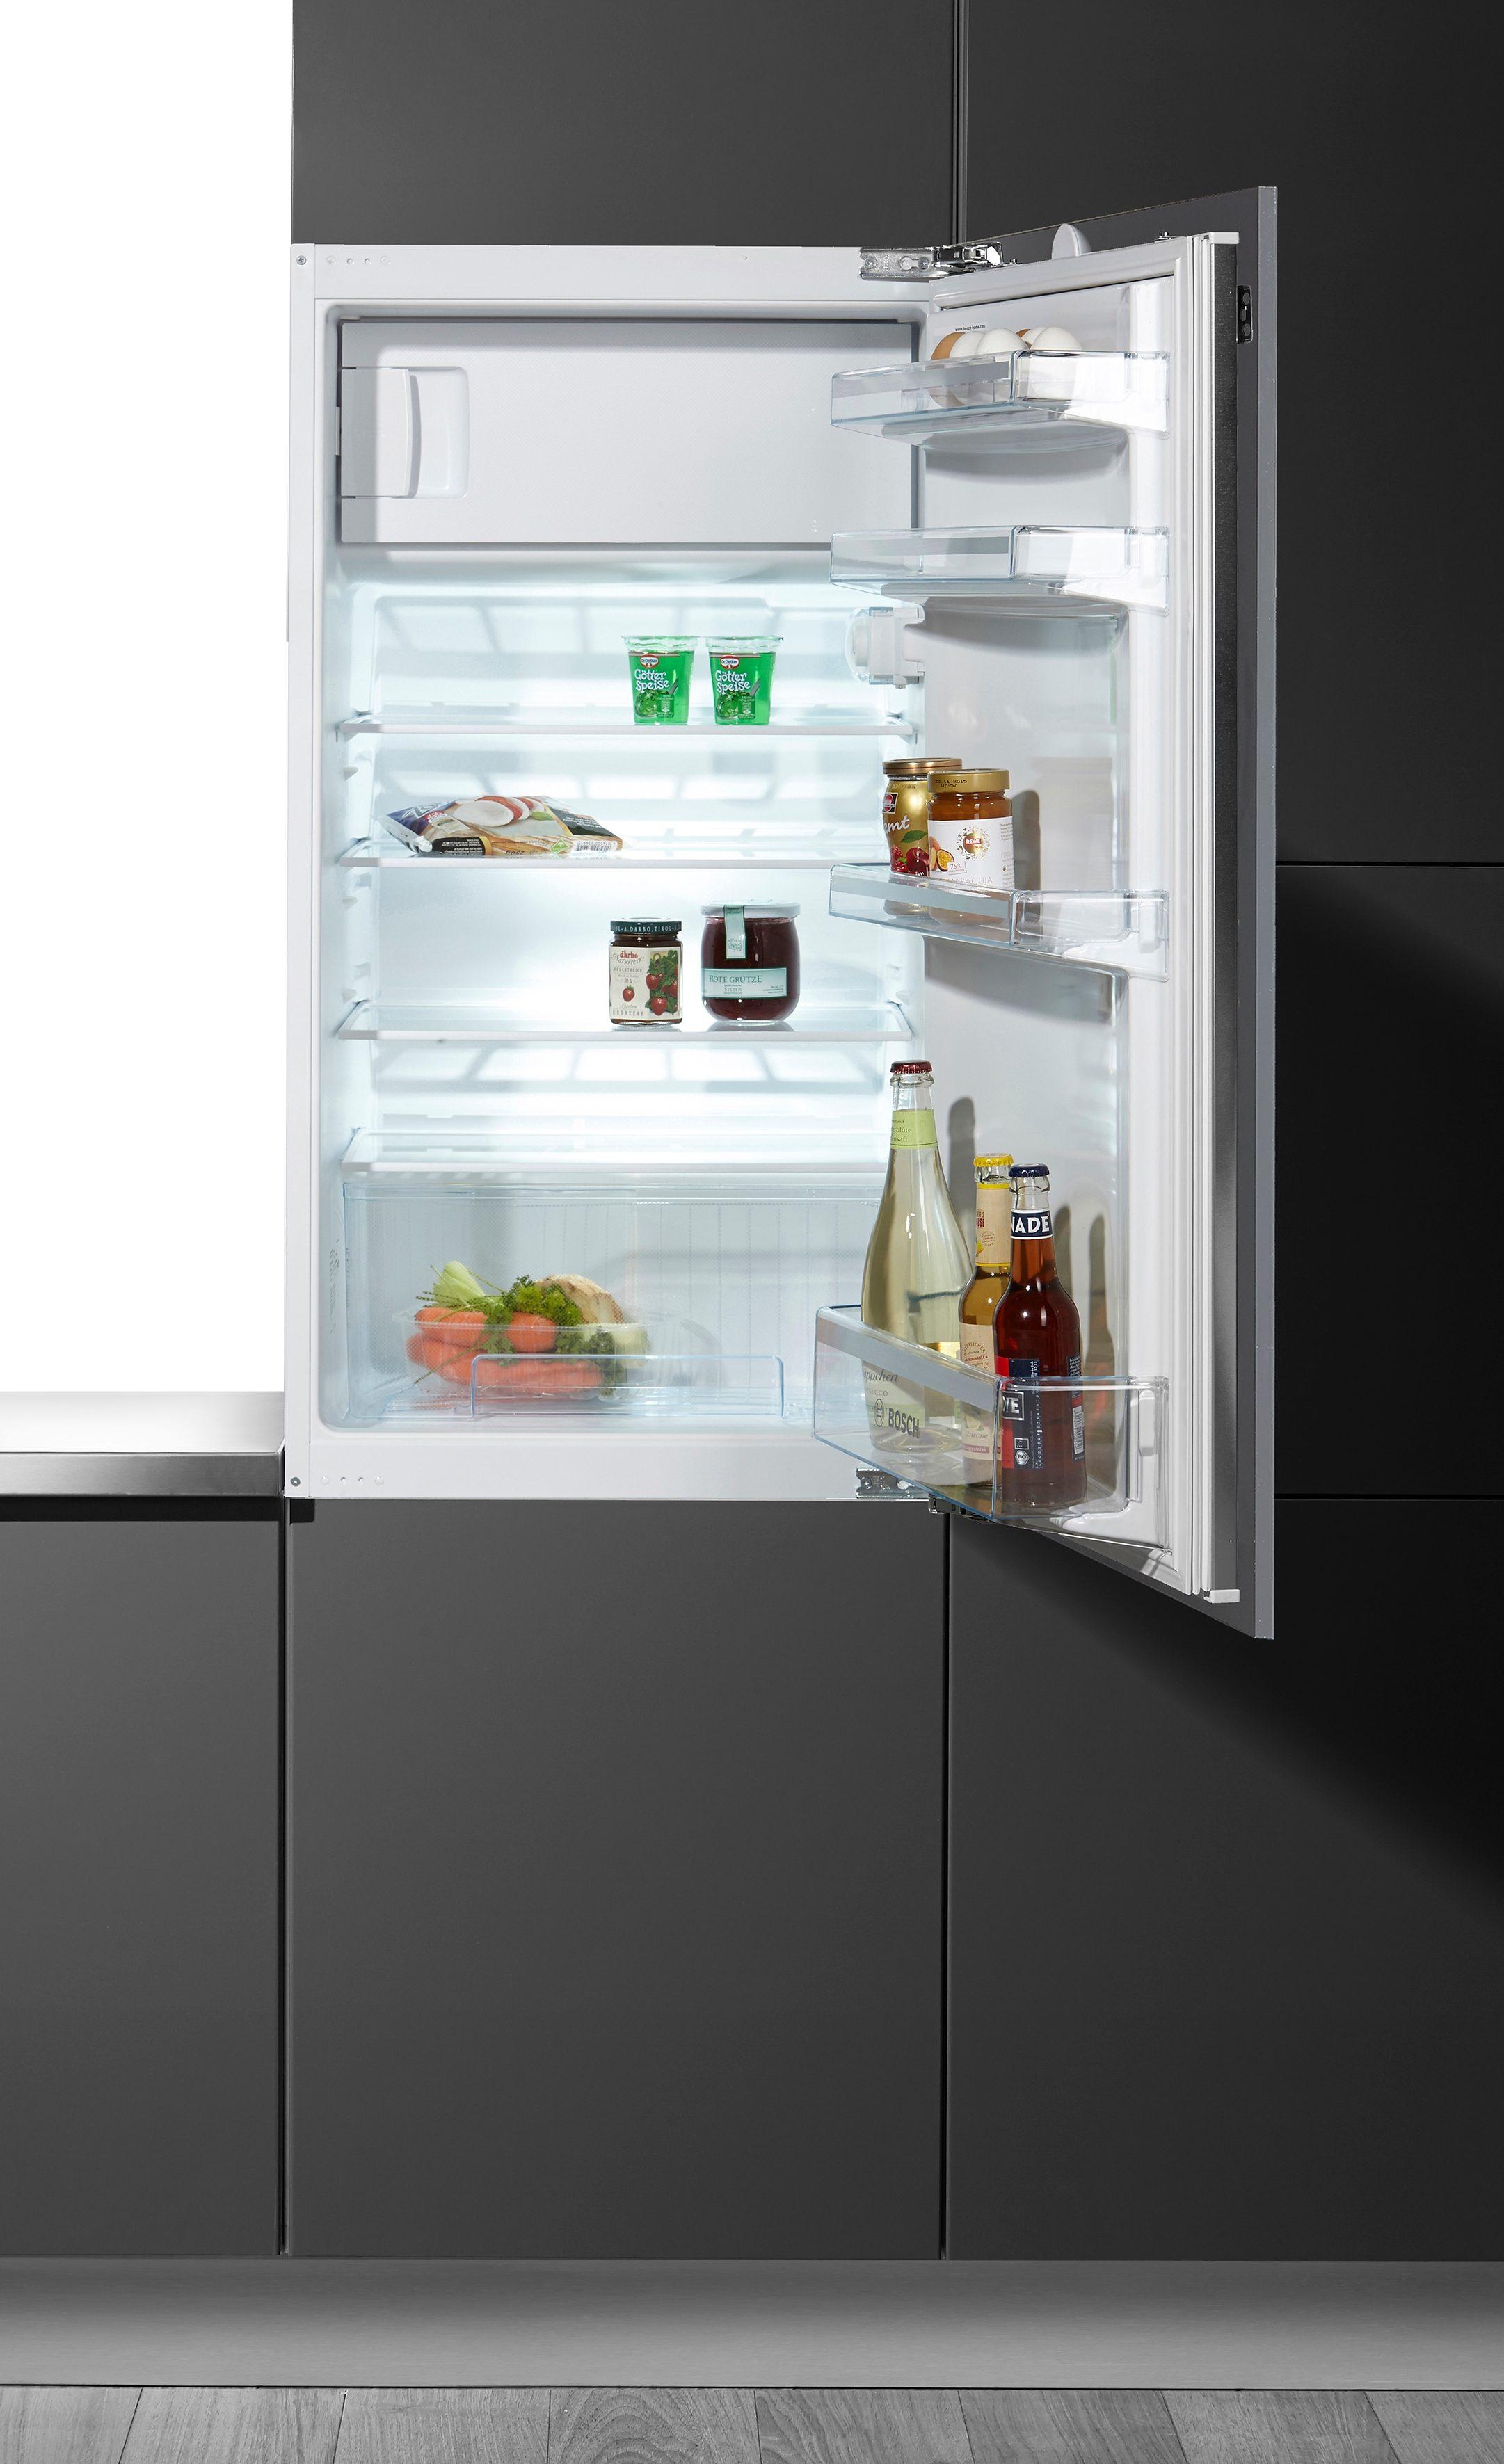 Bosch integrierbarer Einbau-Kühlschrank KIL20V60, A++, 102,5 cm